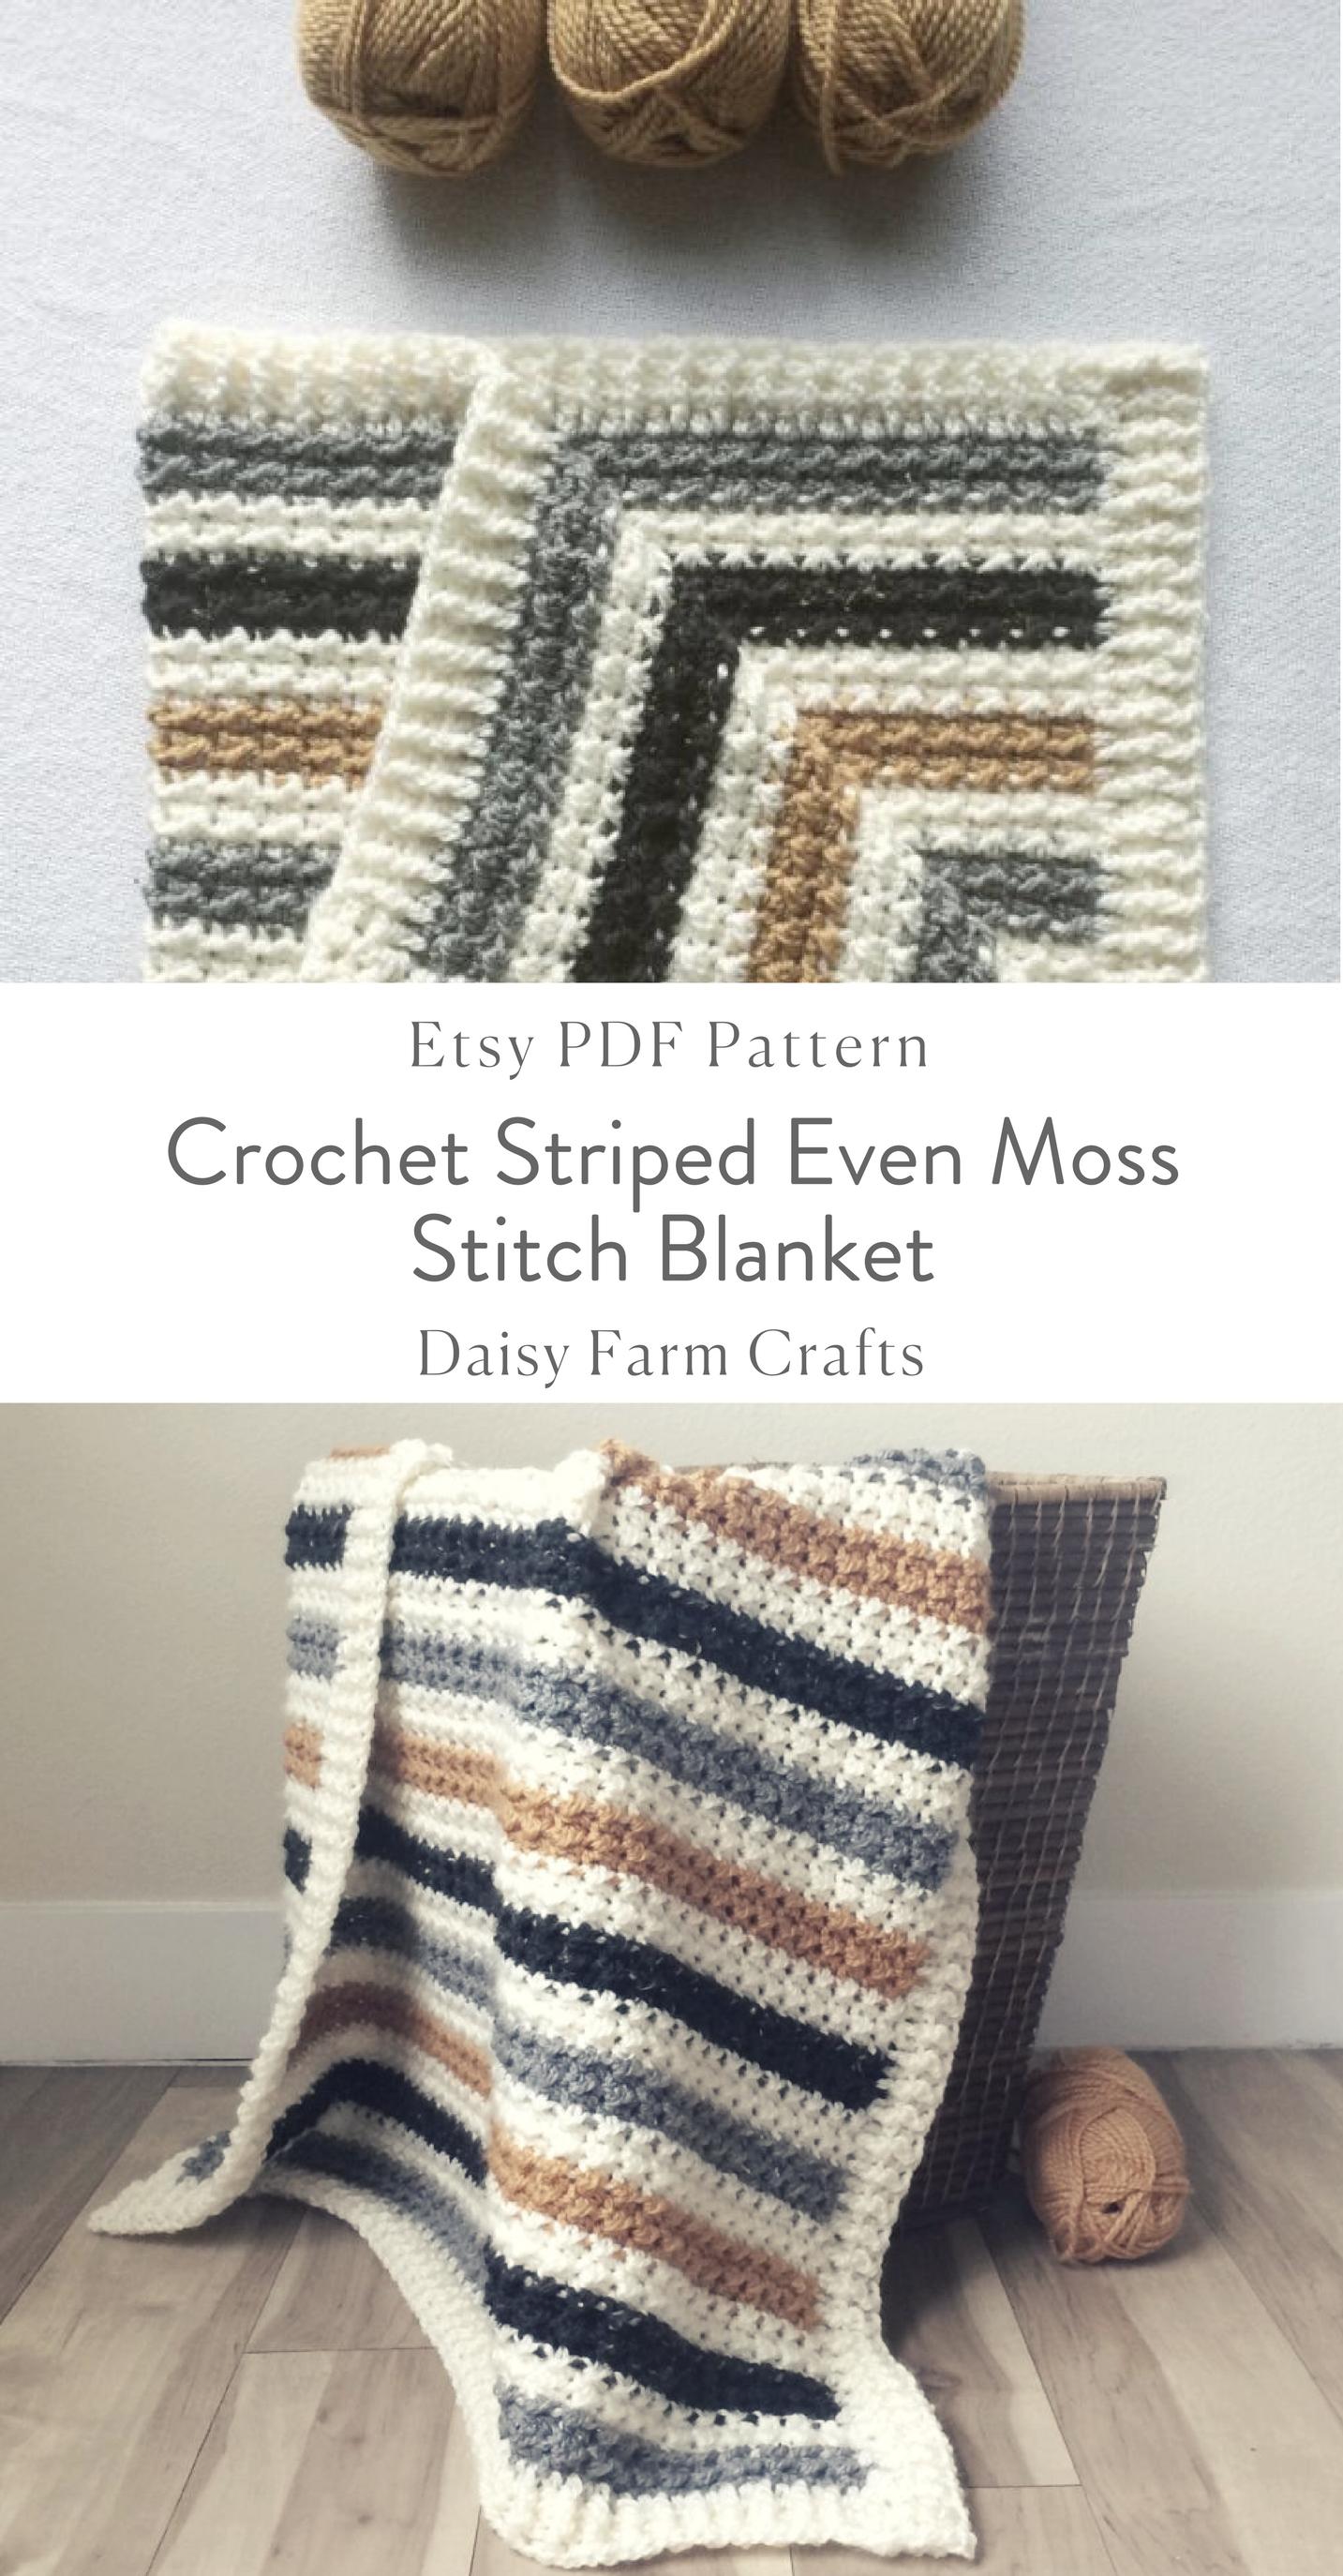 Crochet Striped Even Moss Stitch Blanket Pattern Crochet Etsy